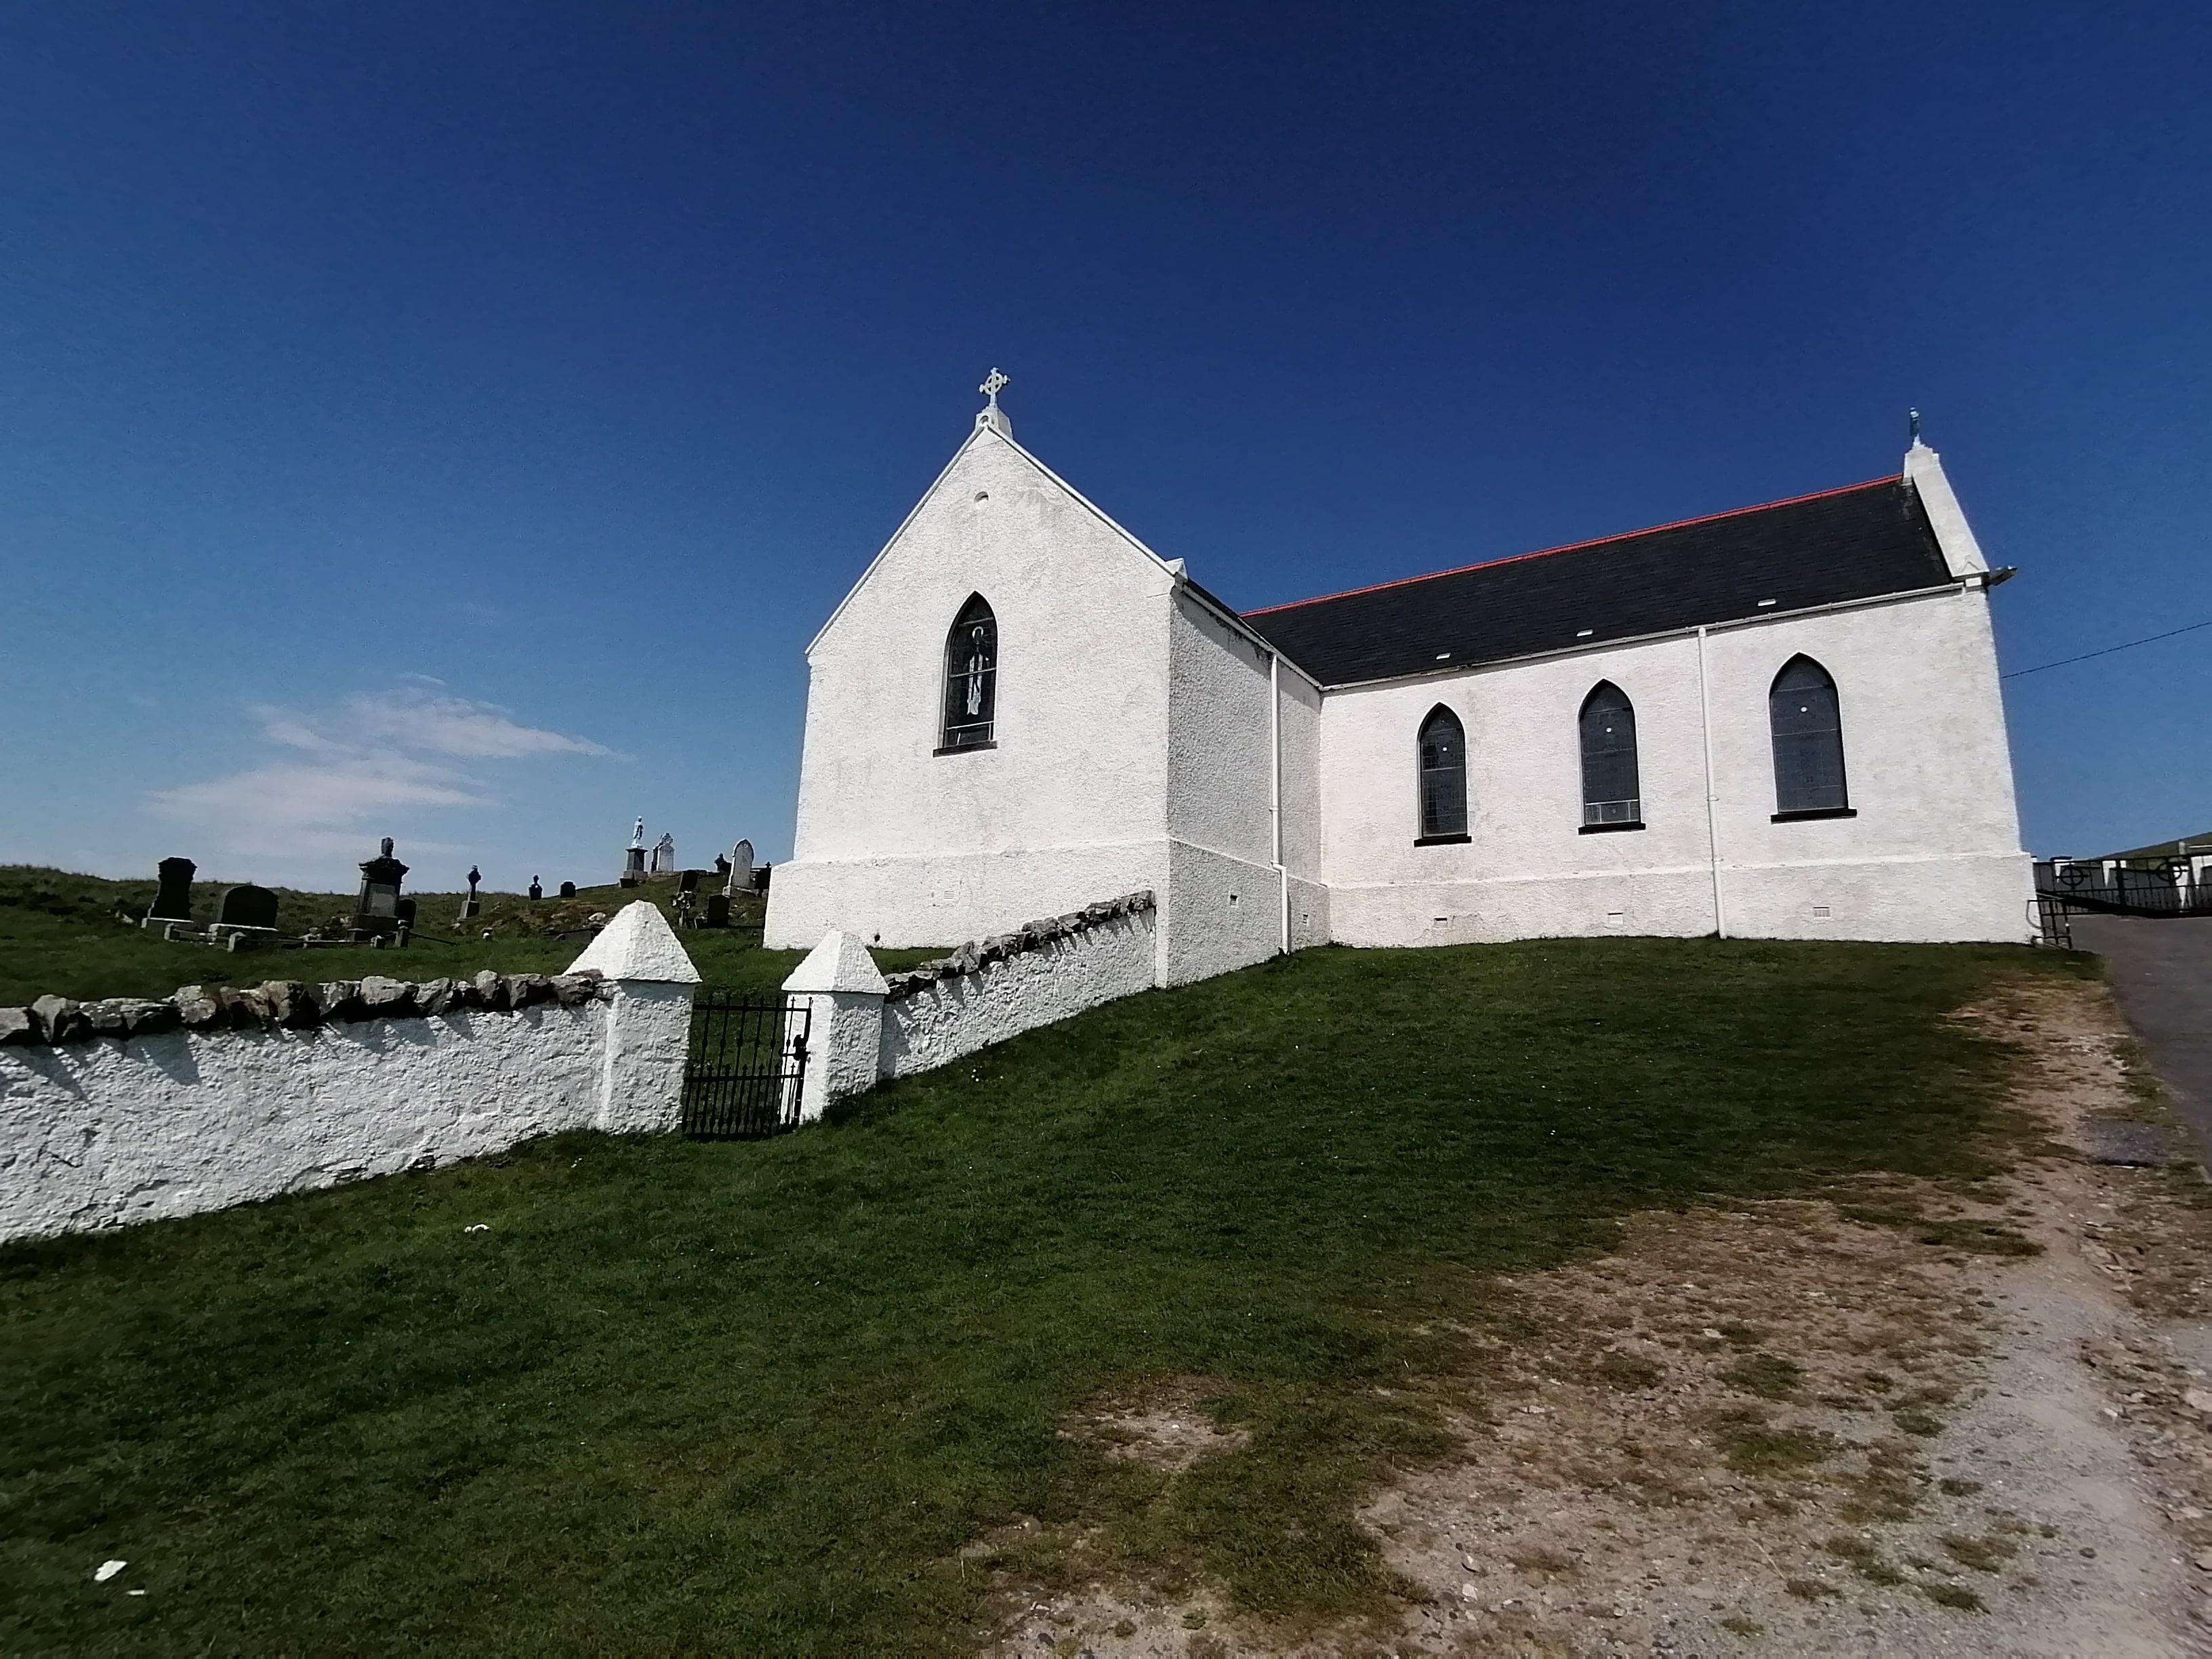 St Mary's Church - Lagg